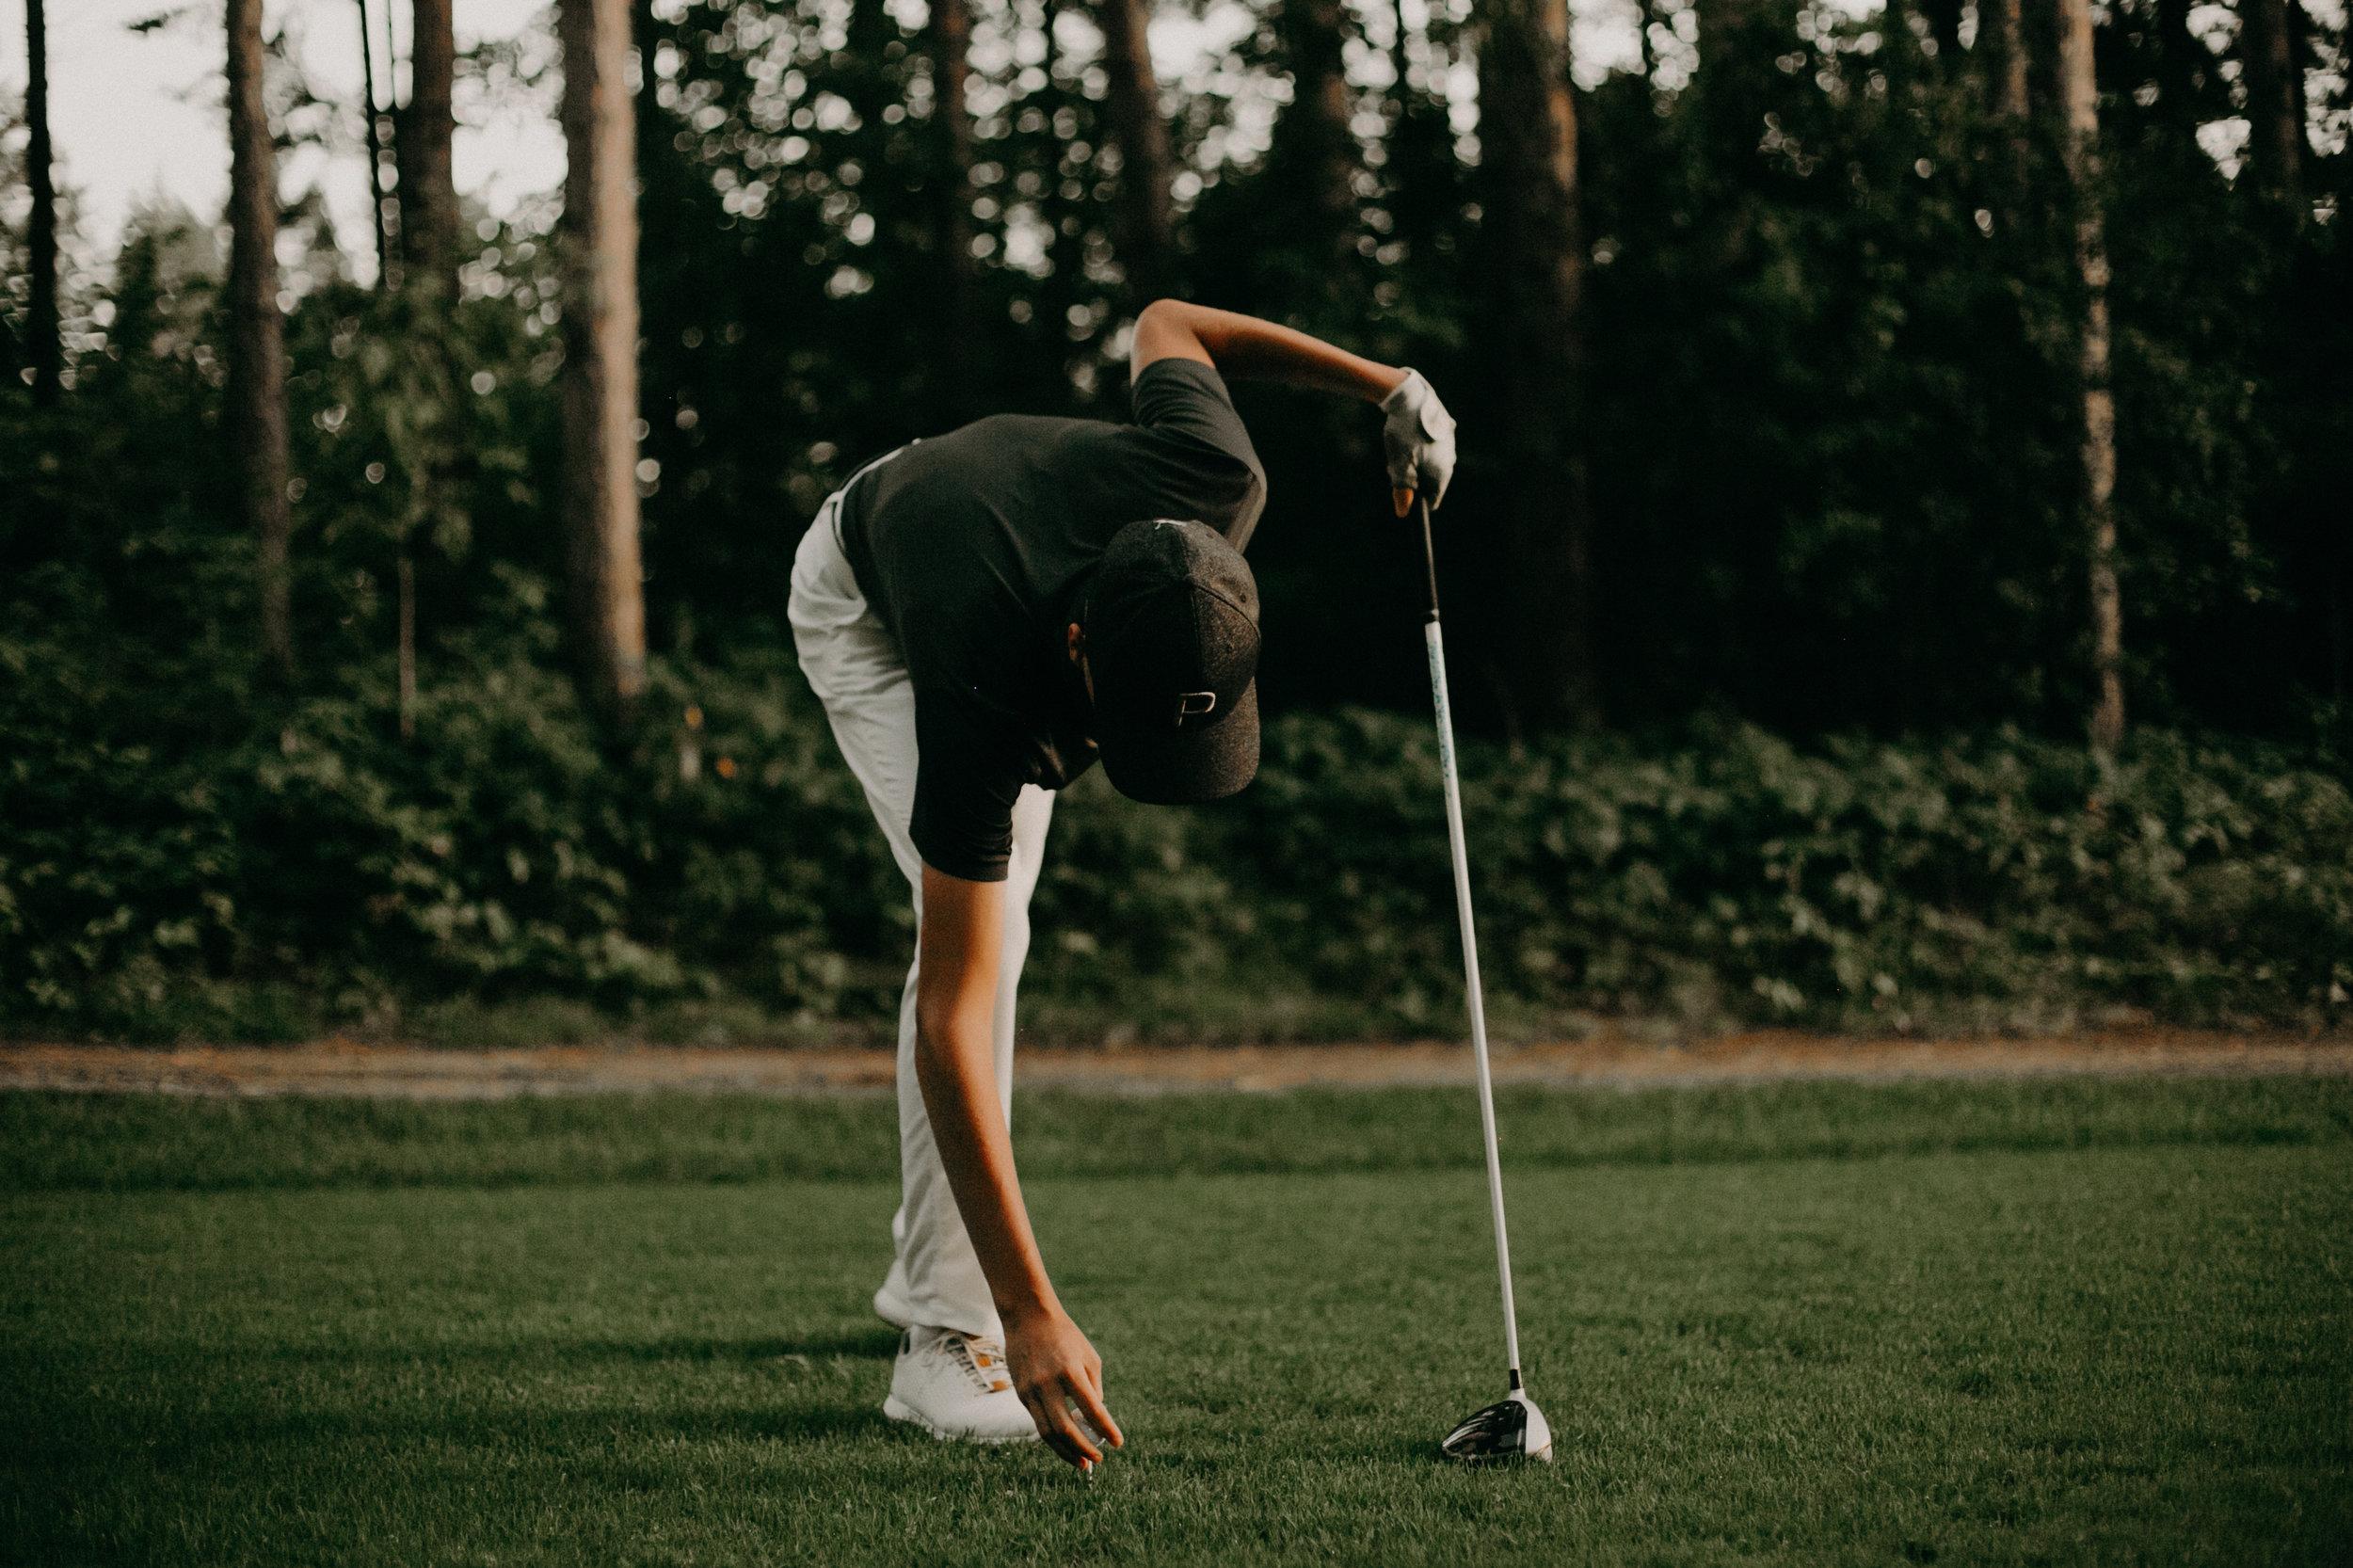 Spring_Valley_Golf_Club_Senior_Session_AWP (25 of 34).jpg